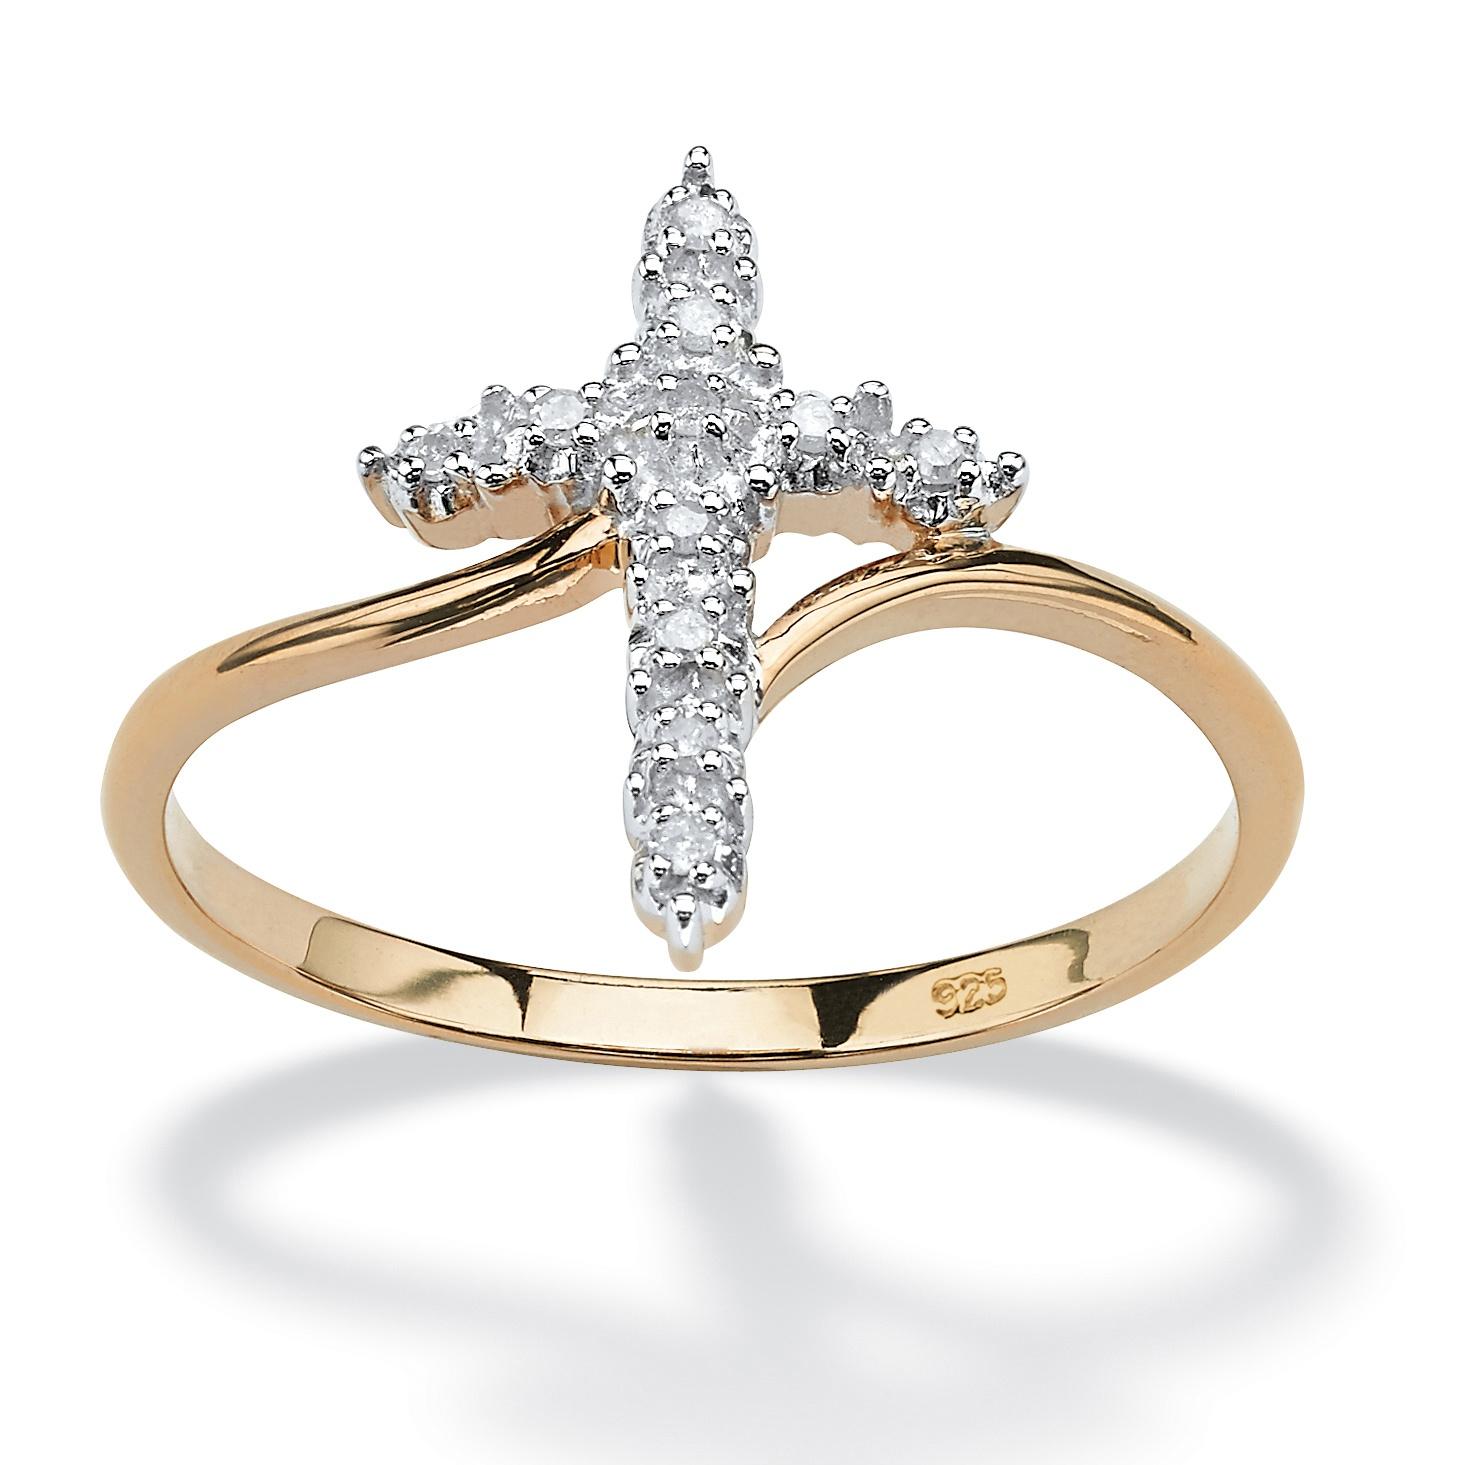 palmbeach jewelry 18k yellow gold 925